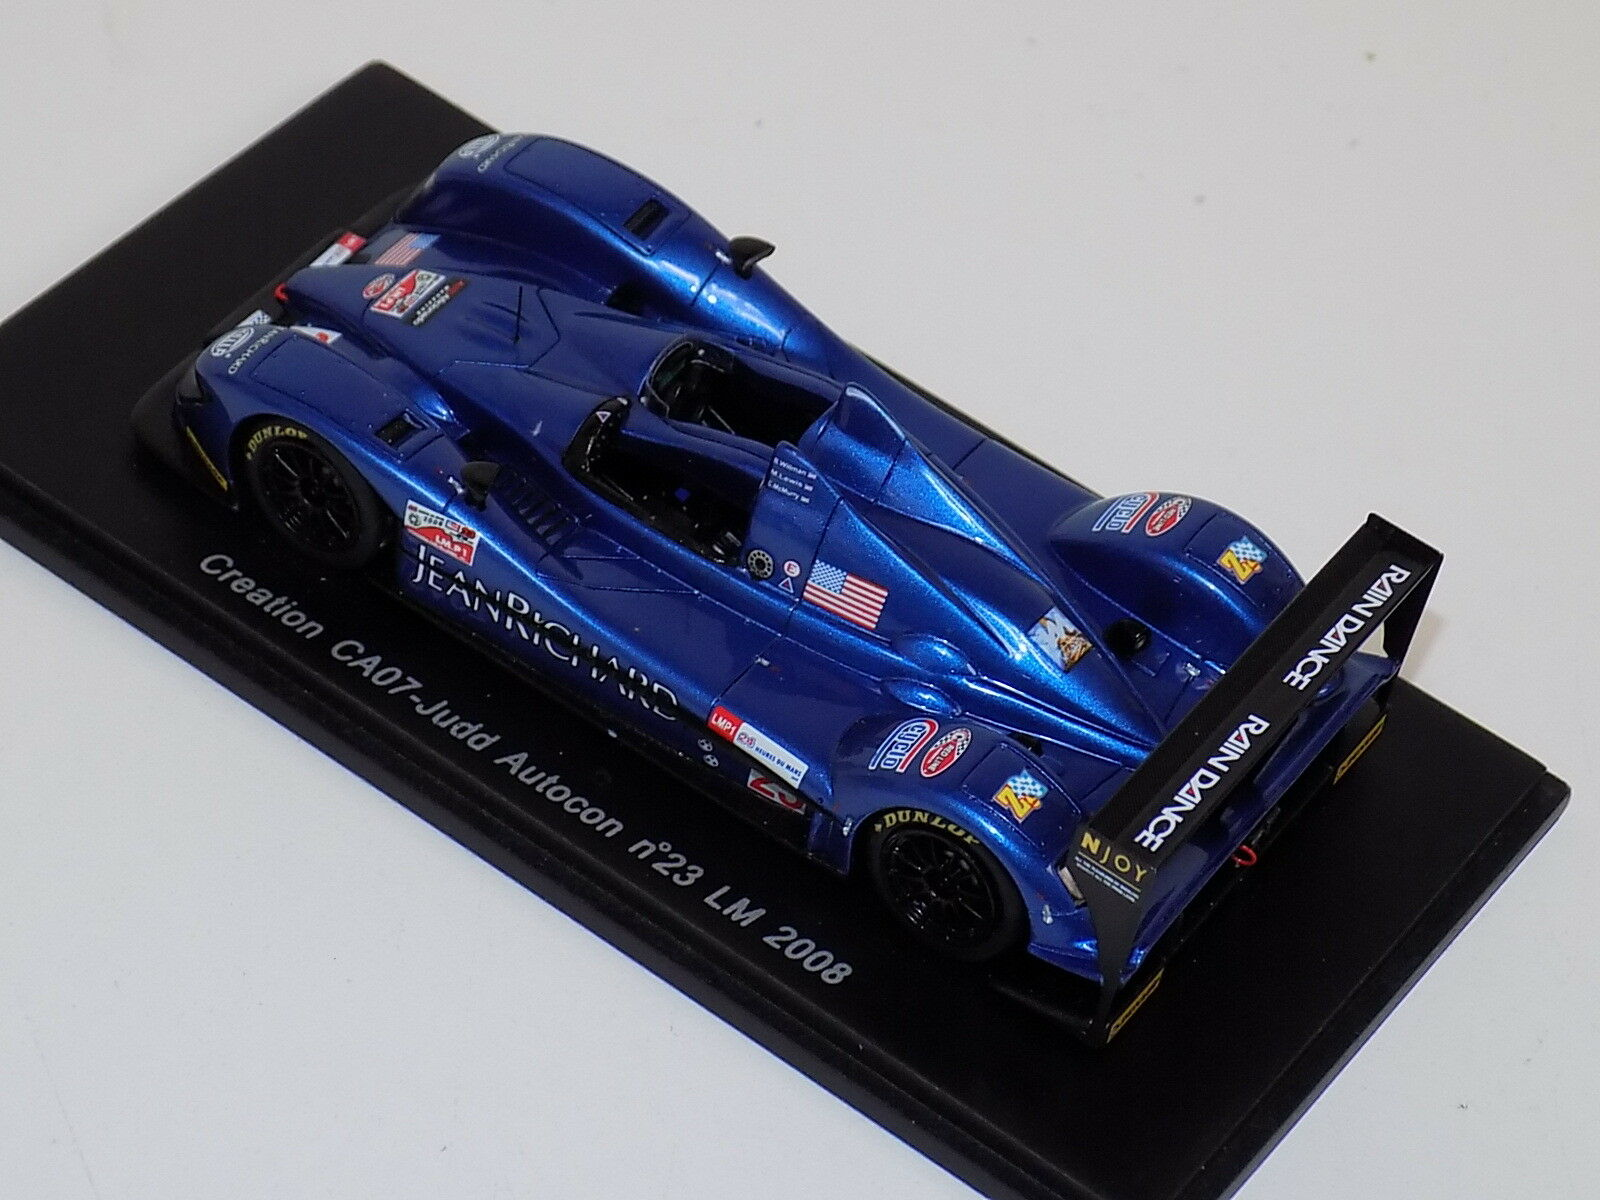 1 43 Spark Creation Judd Judd Judd  Car Hours of LeMans  2008  S1419 effc78